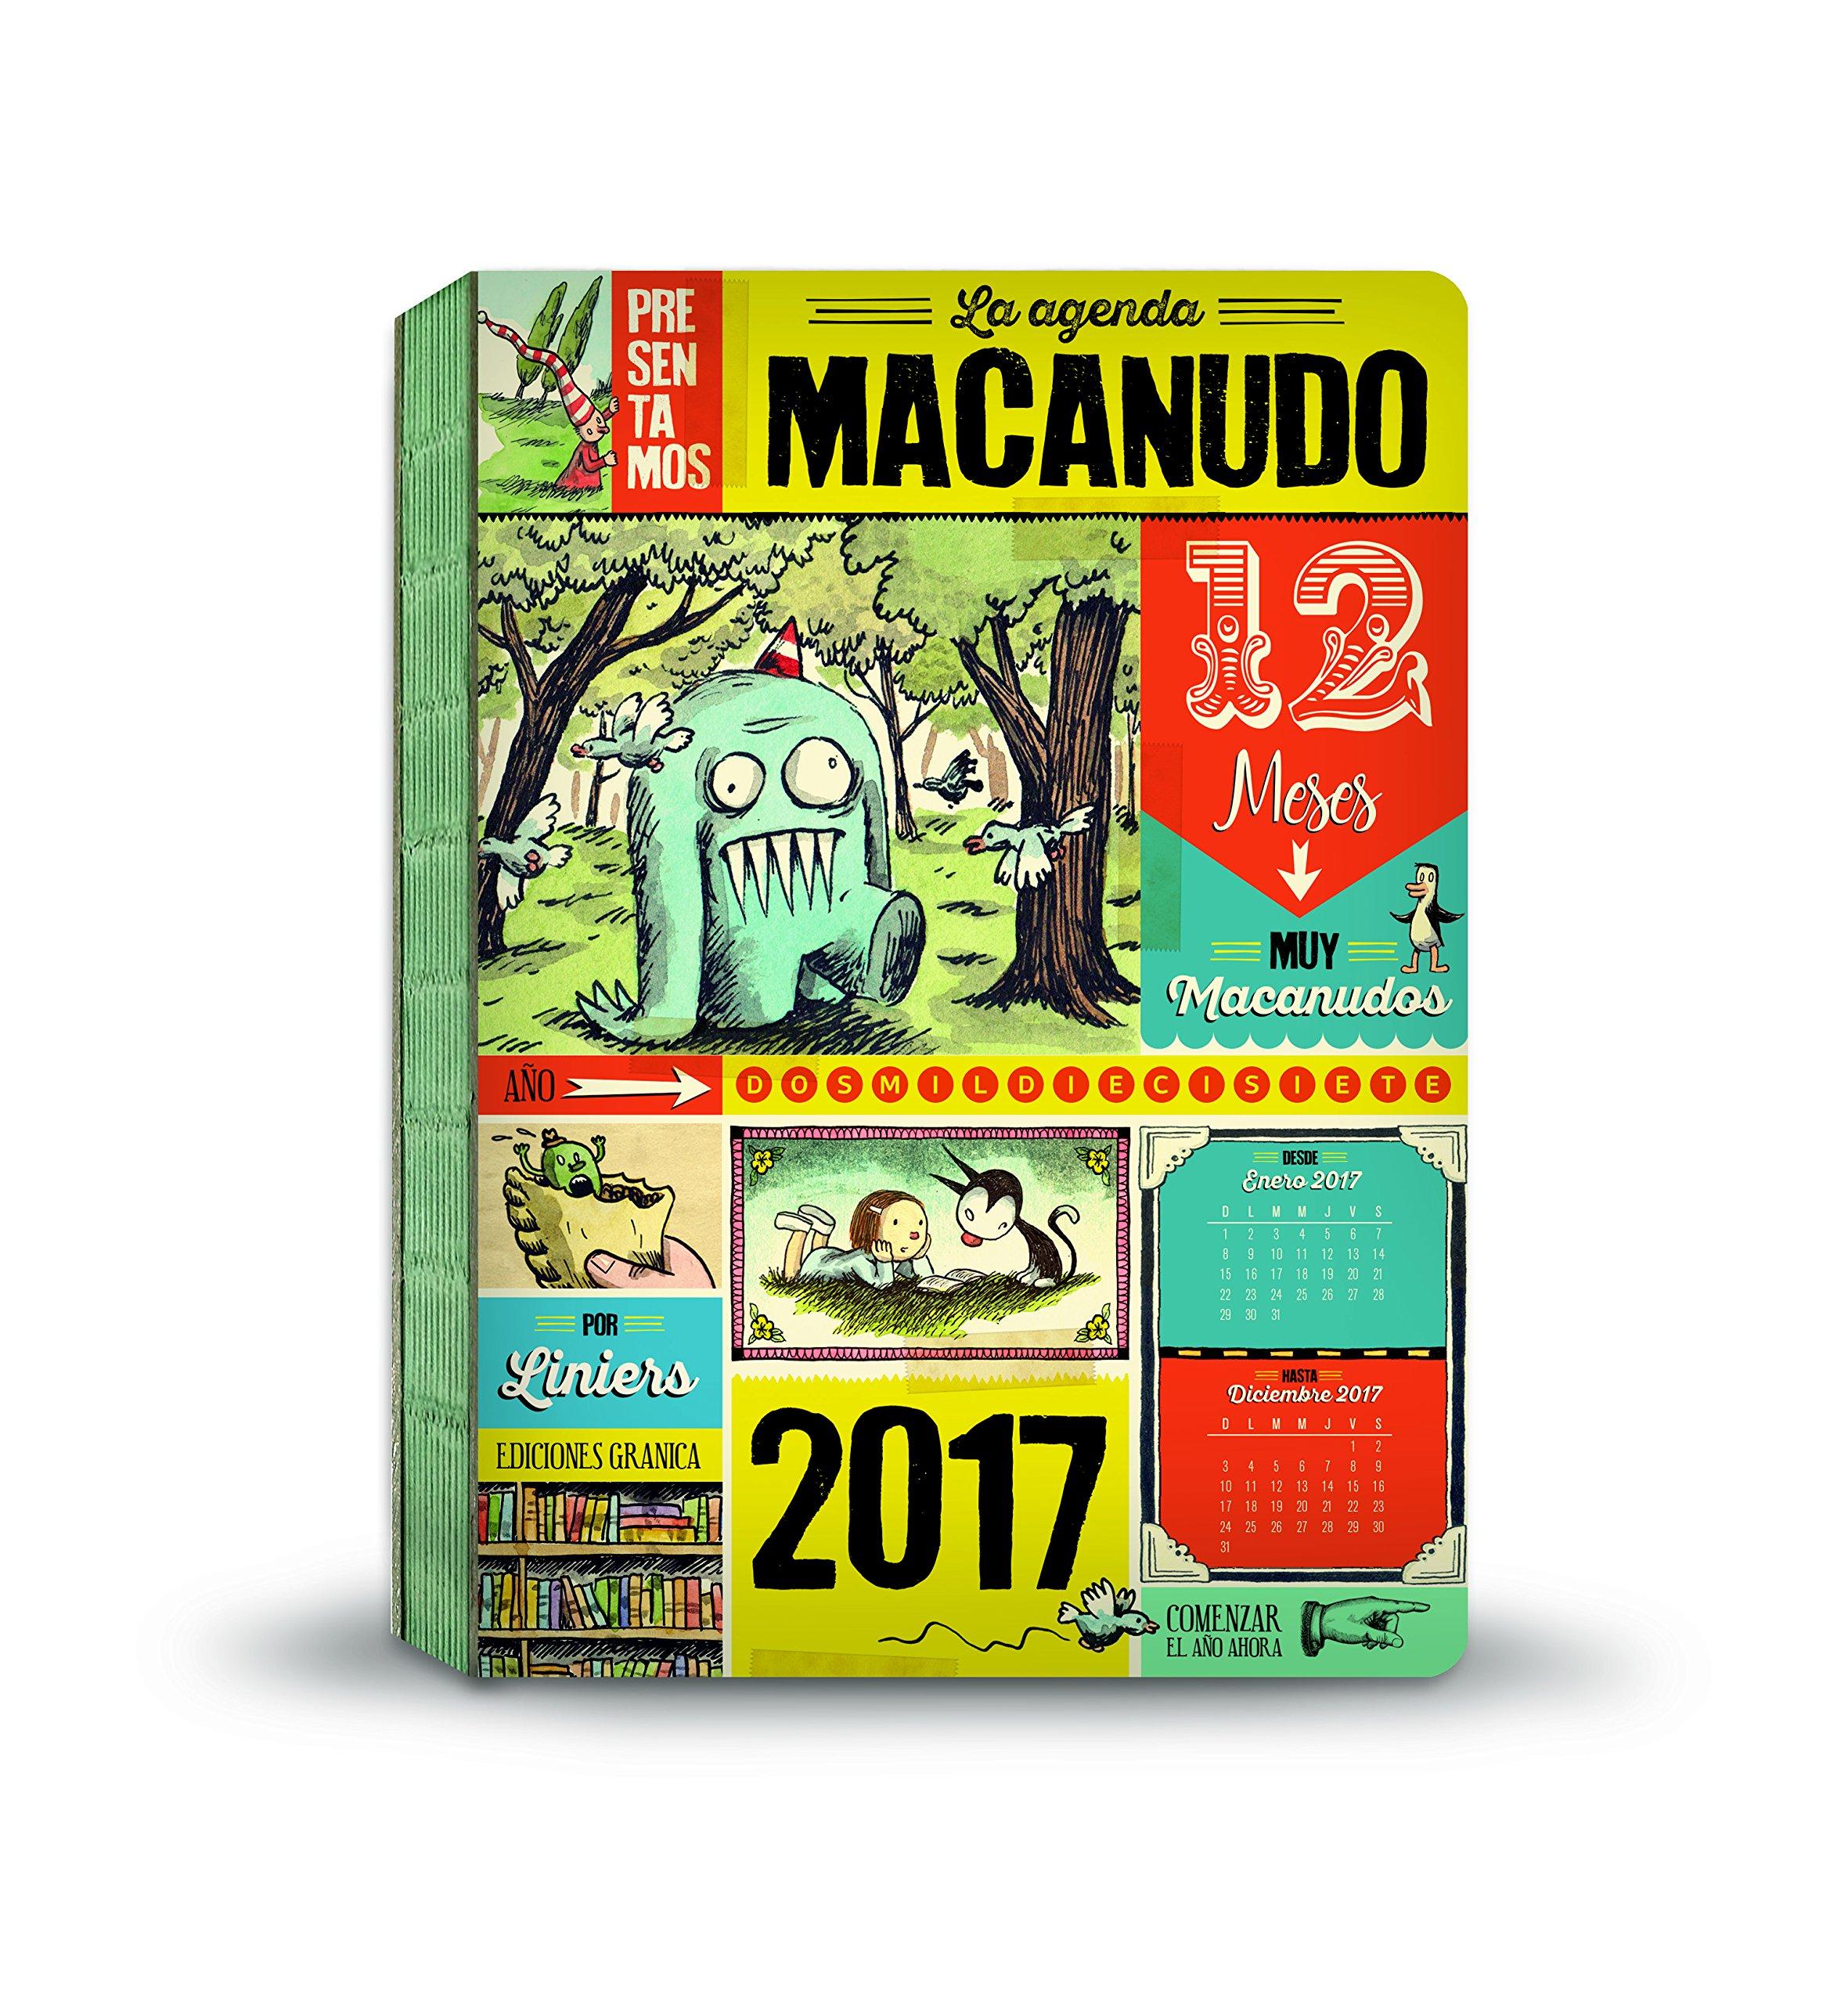 Macanudo 2017 Agenda encuadernada - Personajes (Spanish ...